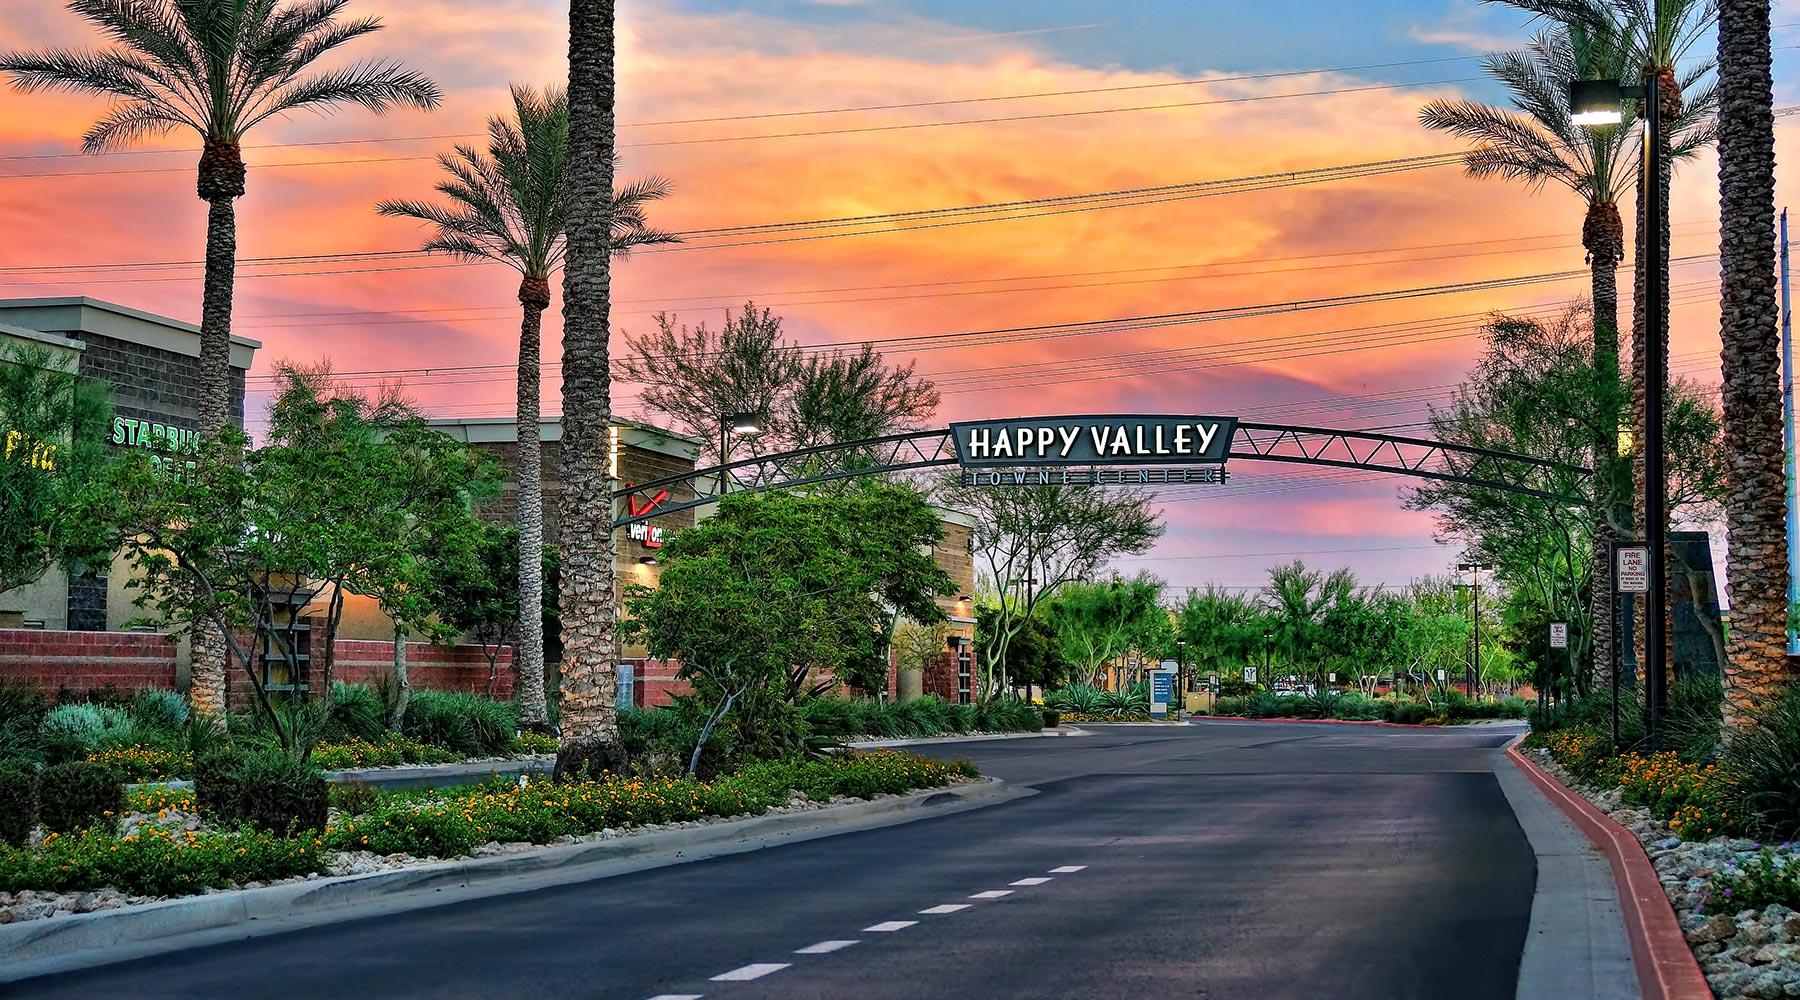 Happy Valley Towne Center